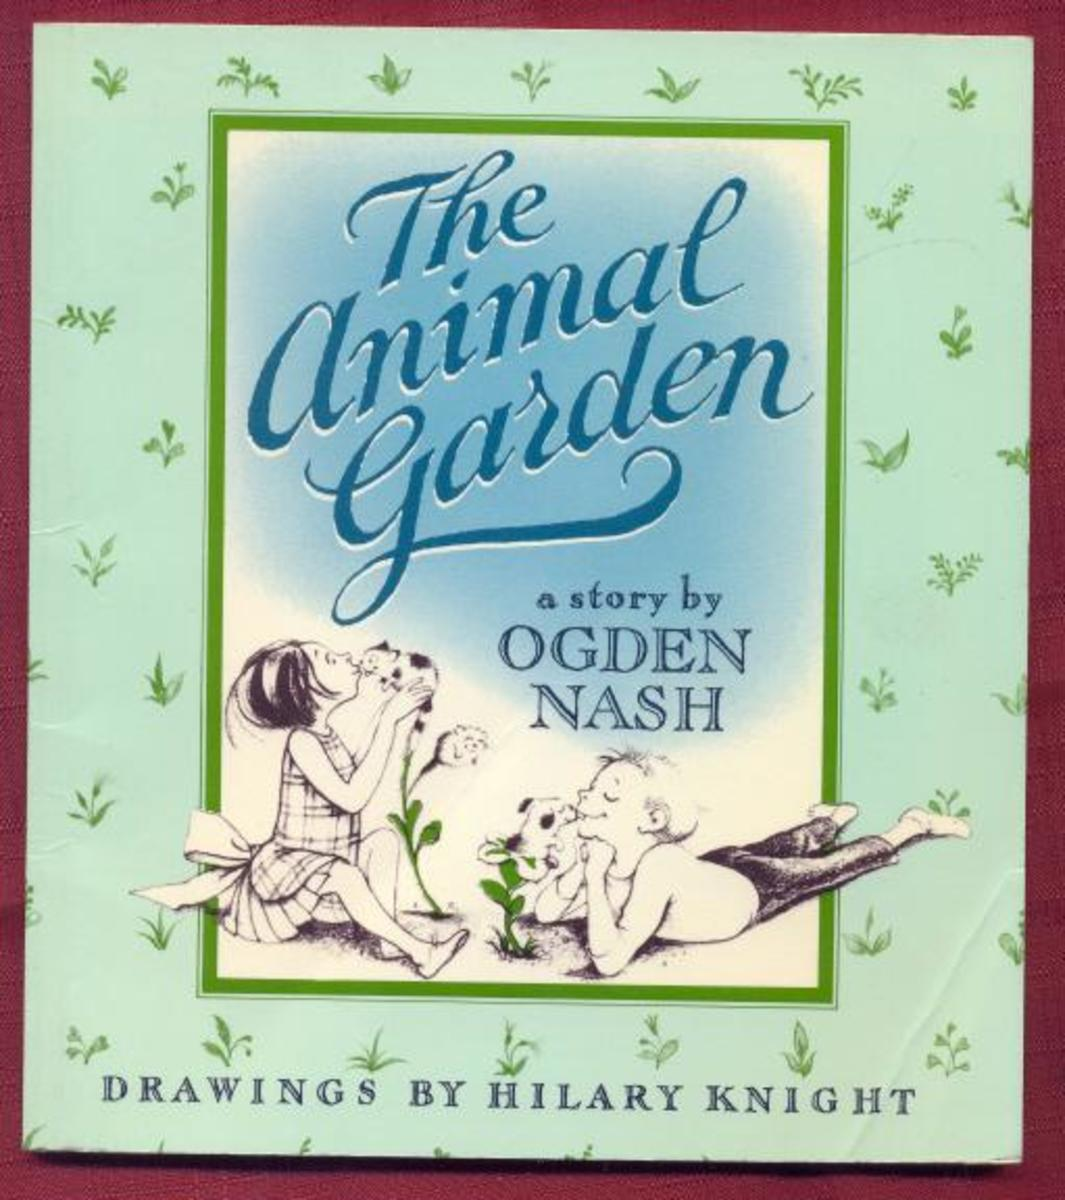 The Animal Garden